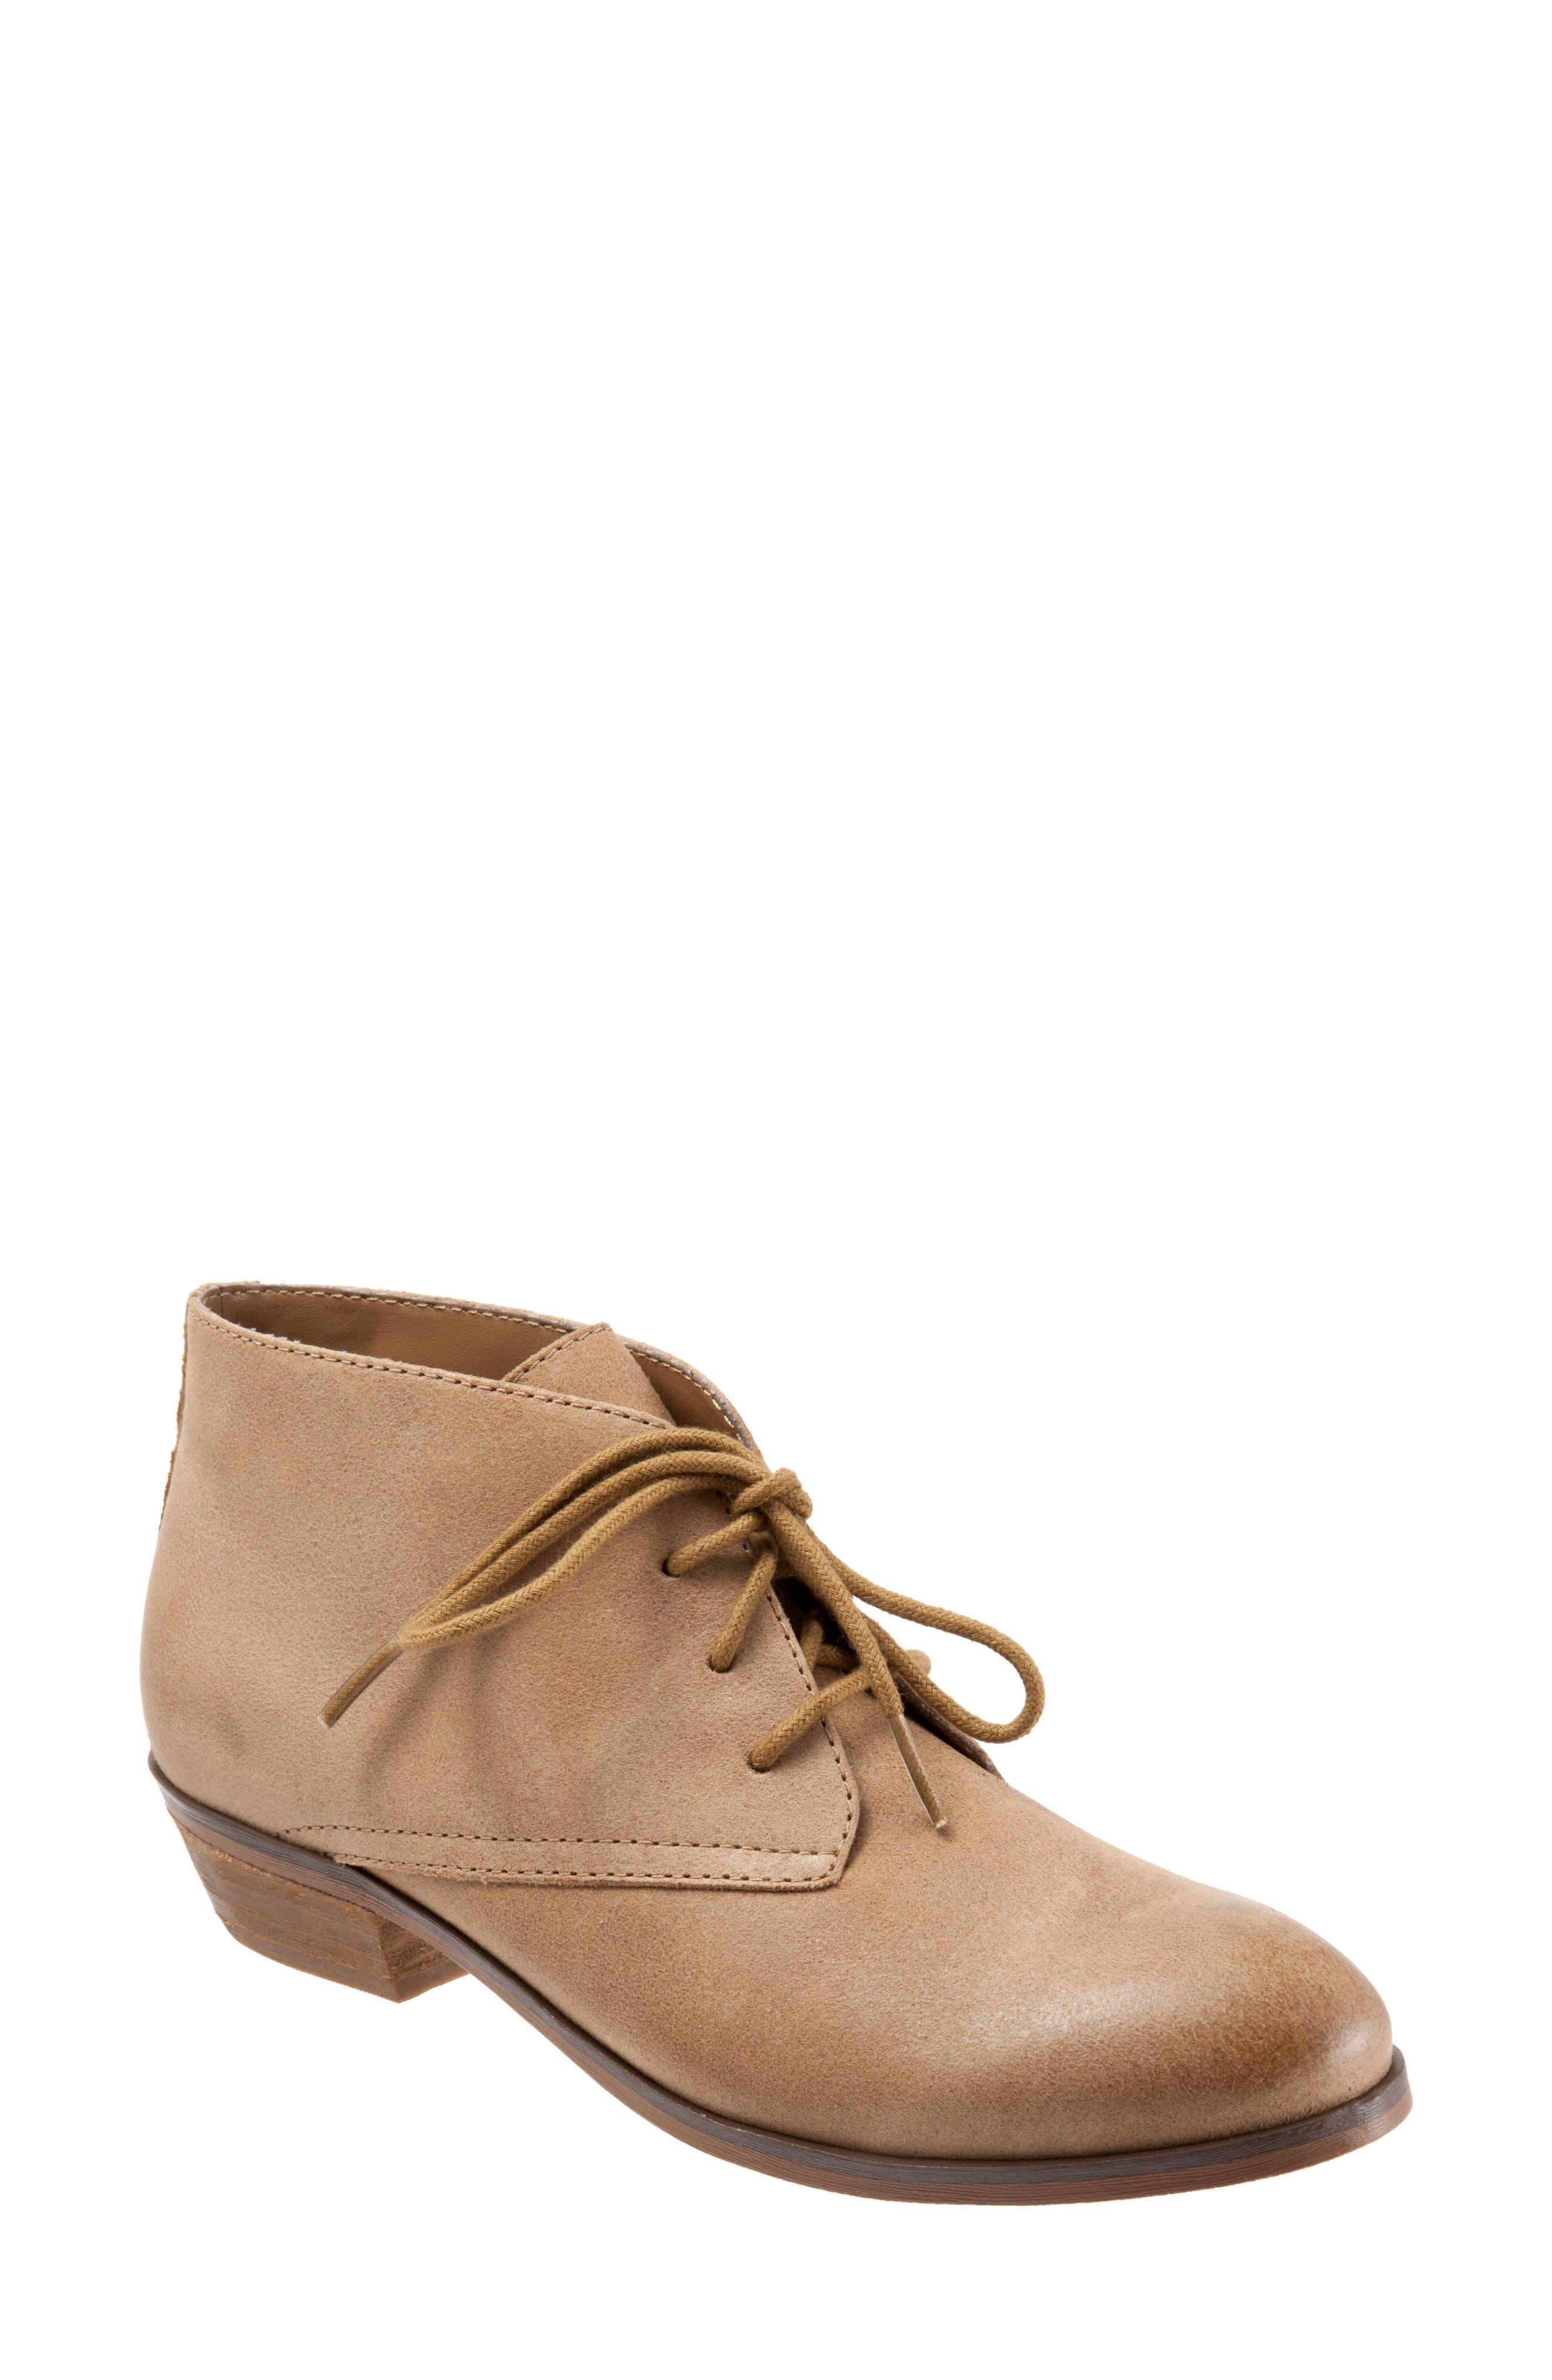 'Ramsey' Chukka Boot,                             Main thumbnail 1, color,                             Sand Leather